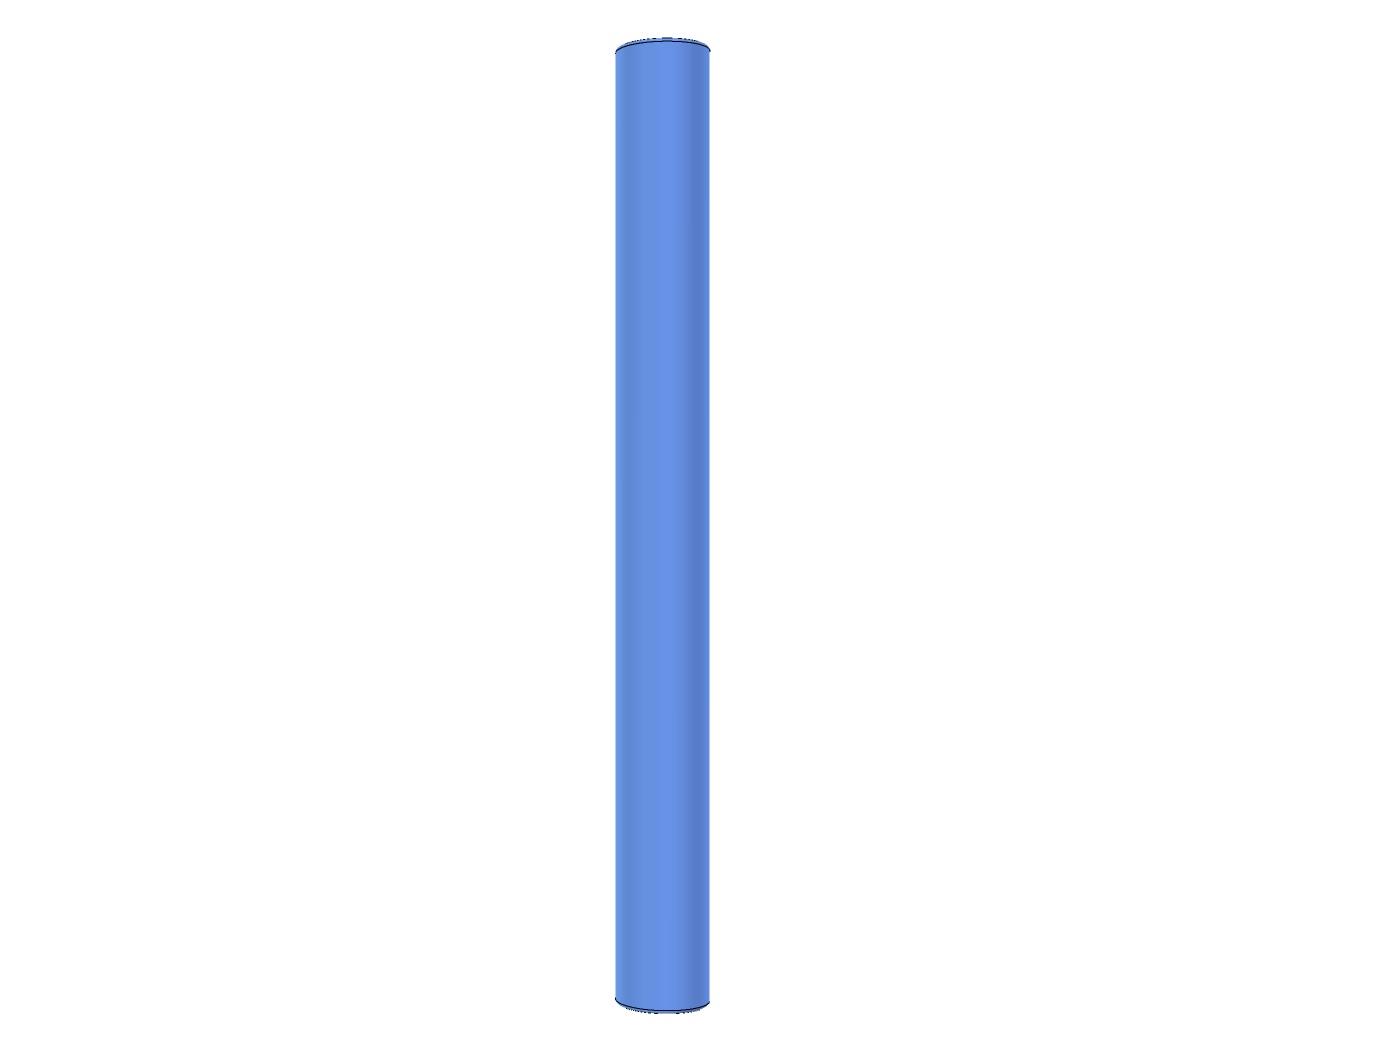 Pålboj 2,5 m